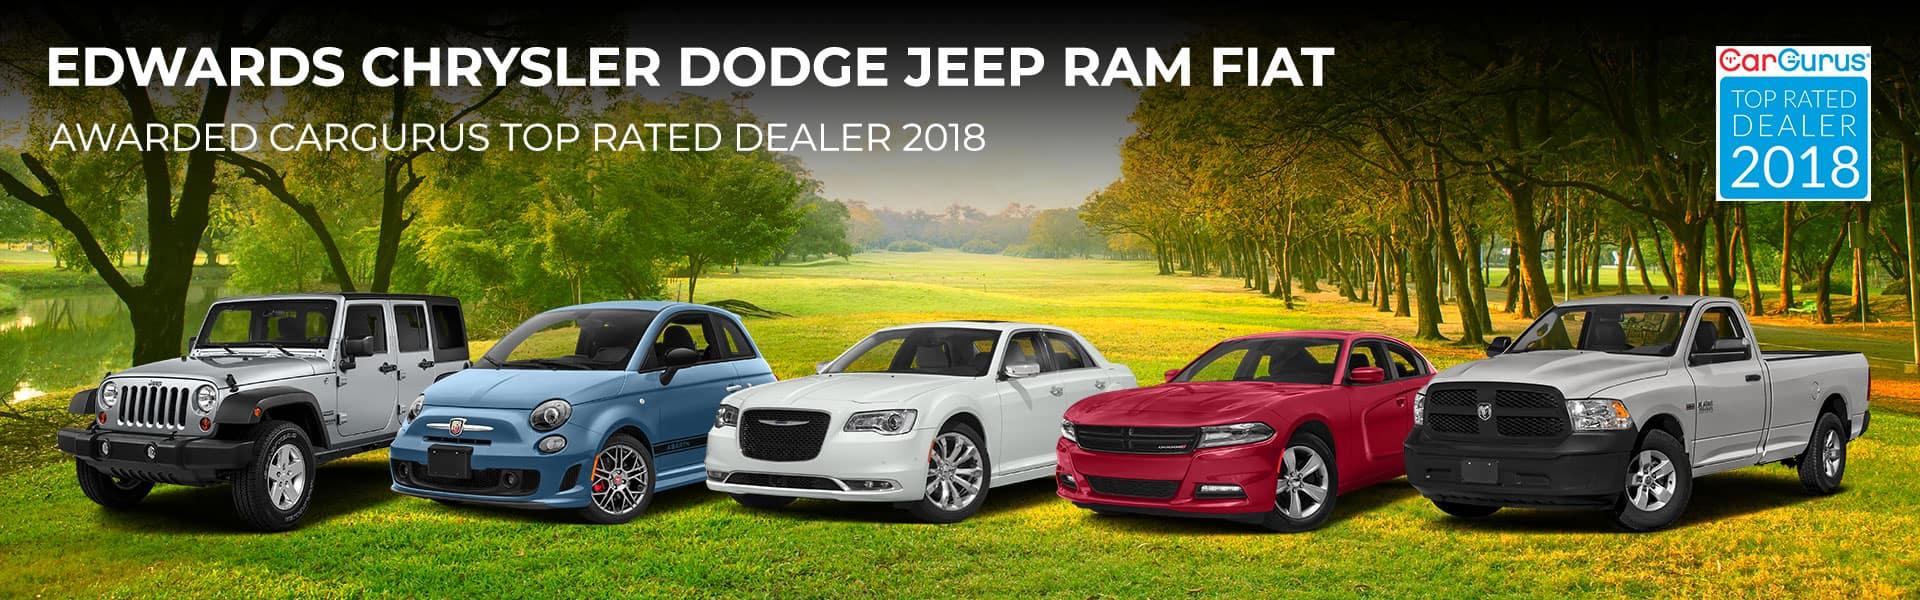 Edwards Chrysler Dodge Jeep Ram Fiat Auto Dealer Service